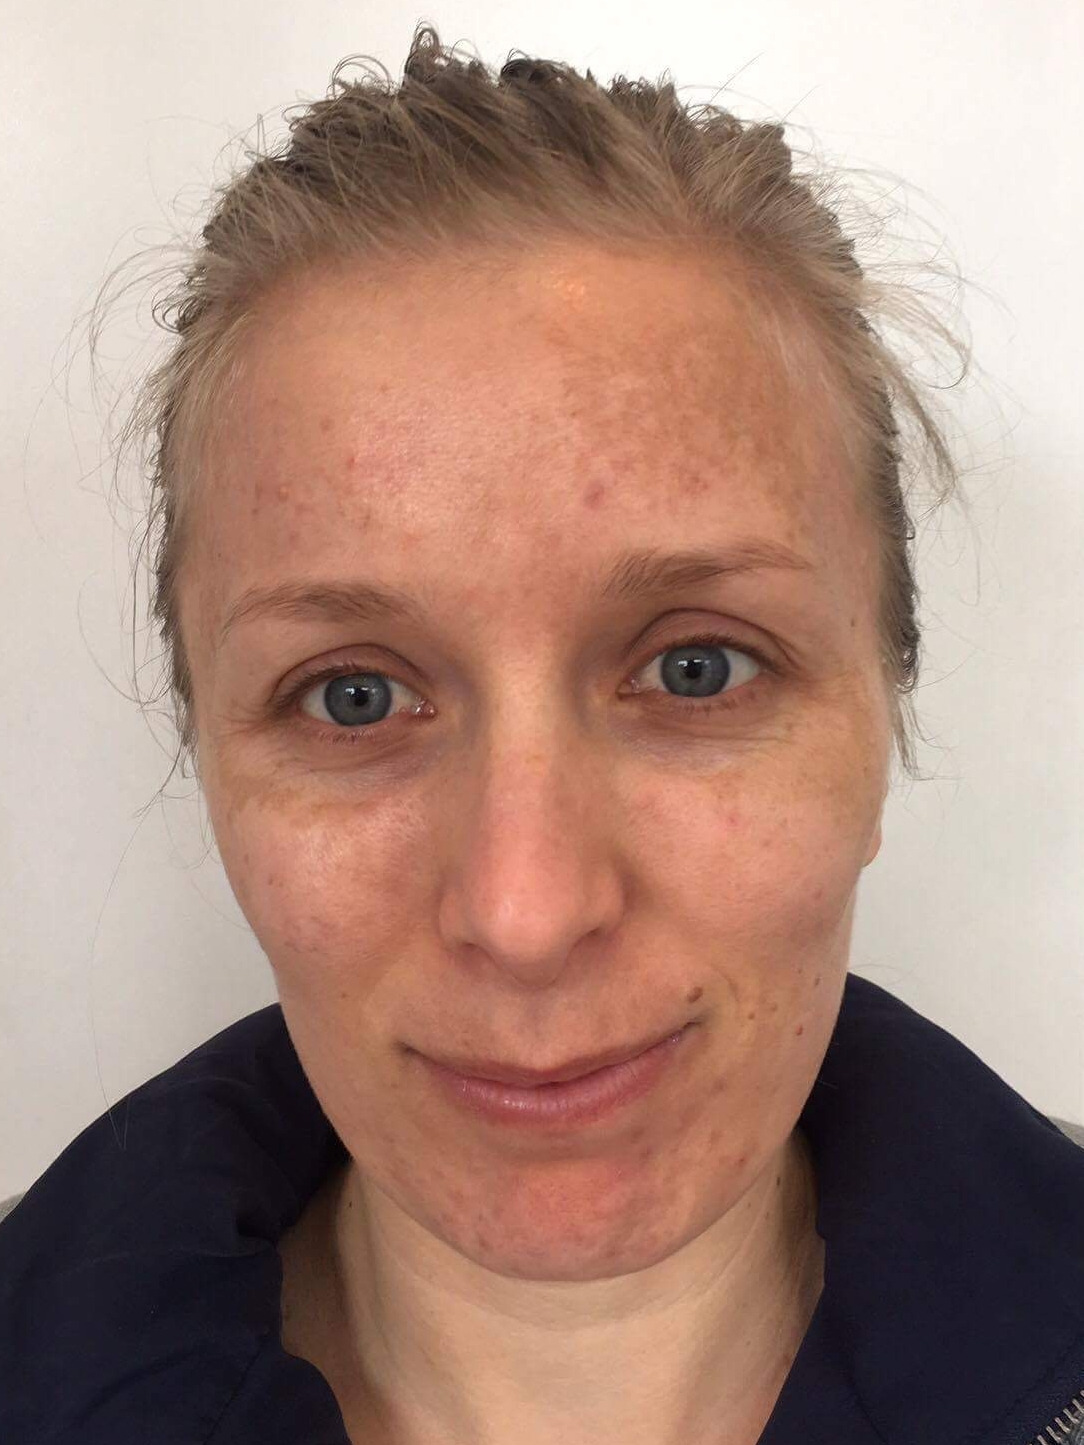 cosmelan dermamelan depigmentation pigmentation skin treatment melasma